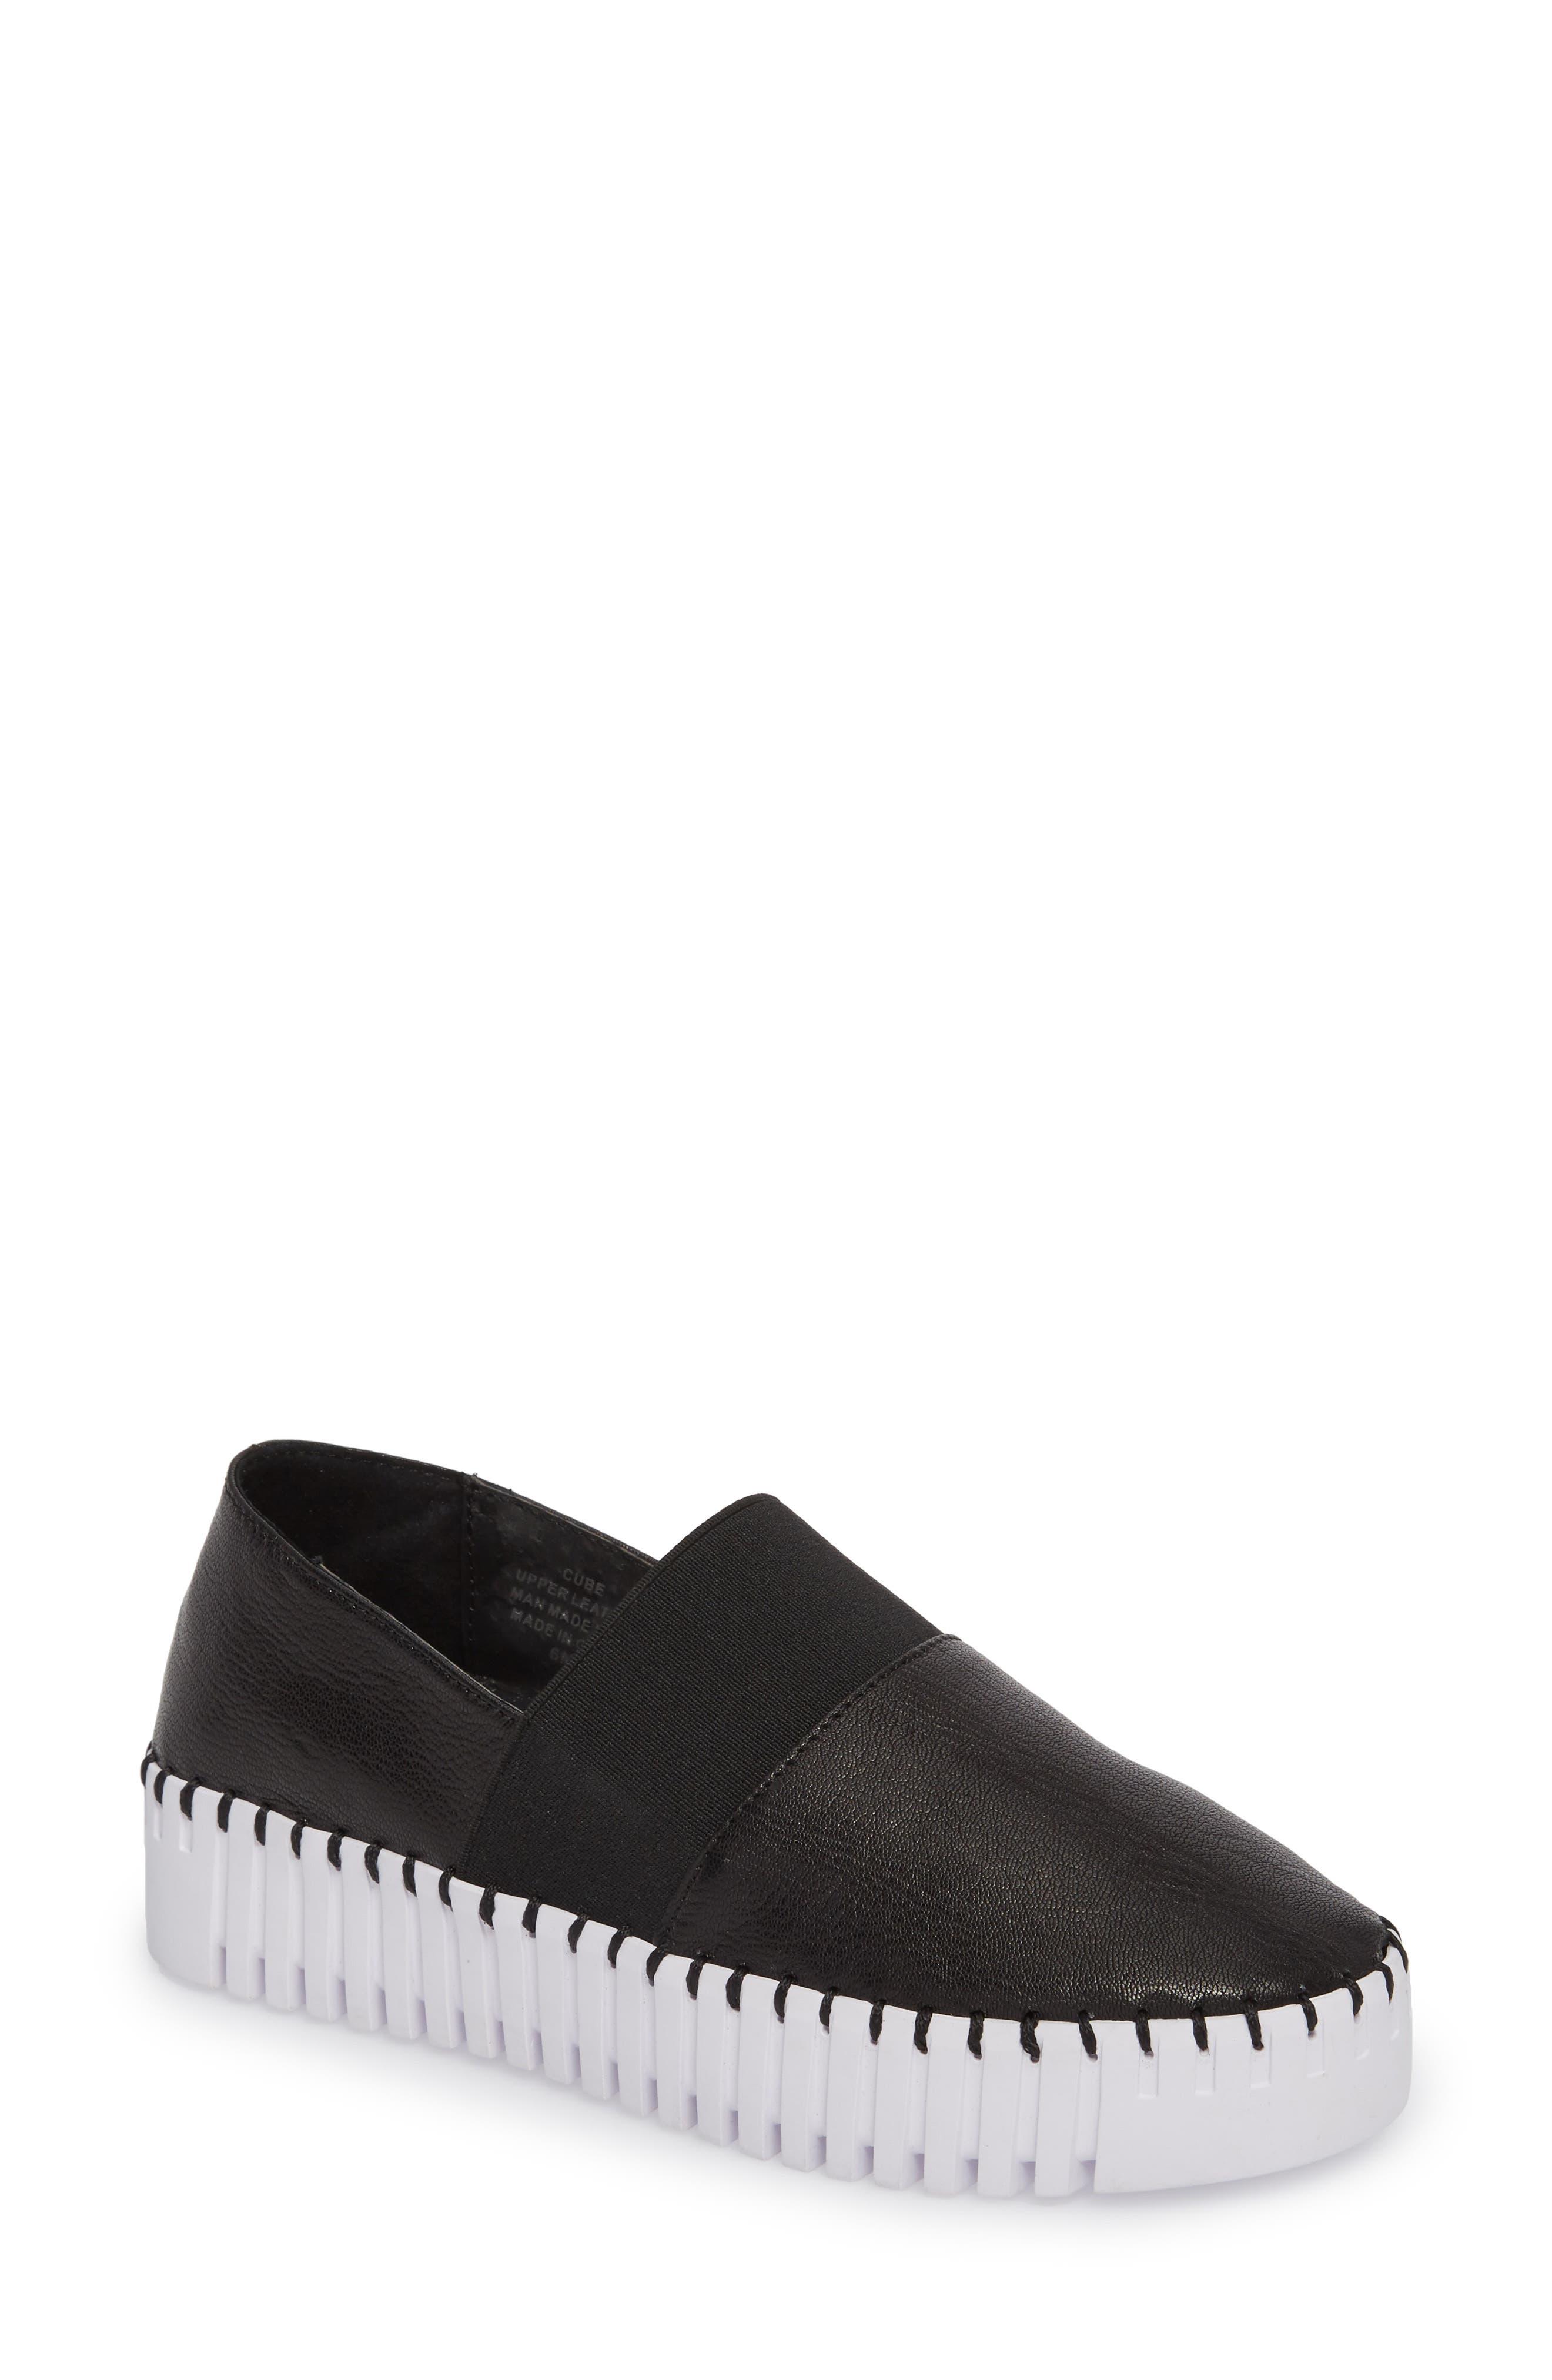 Cube Slip-On Platform Sneaker,                             Main thumbnail 1, color,                             Black Leather